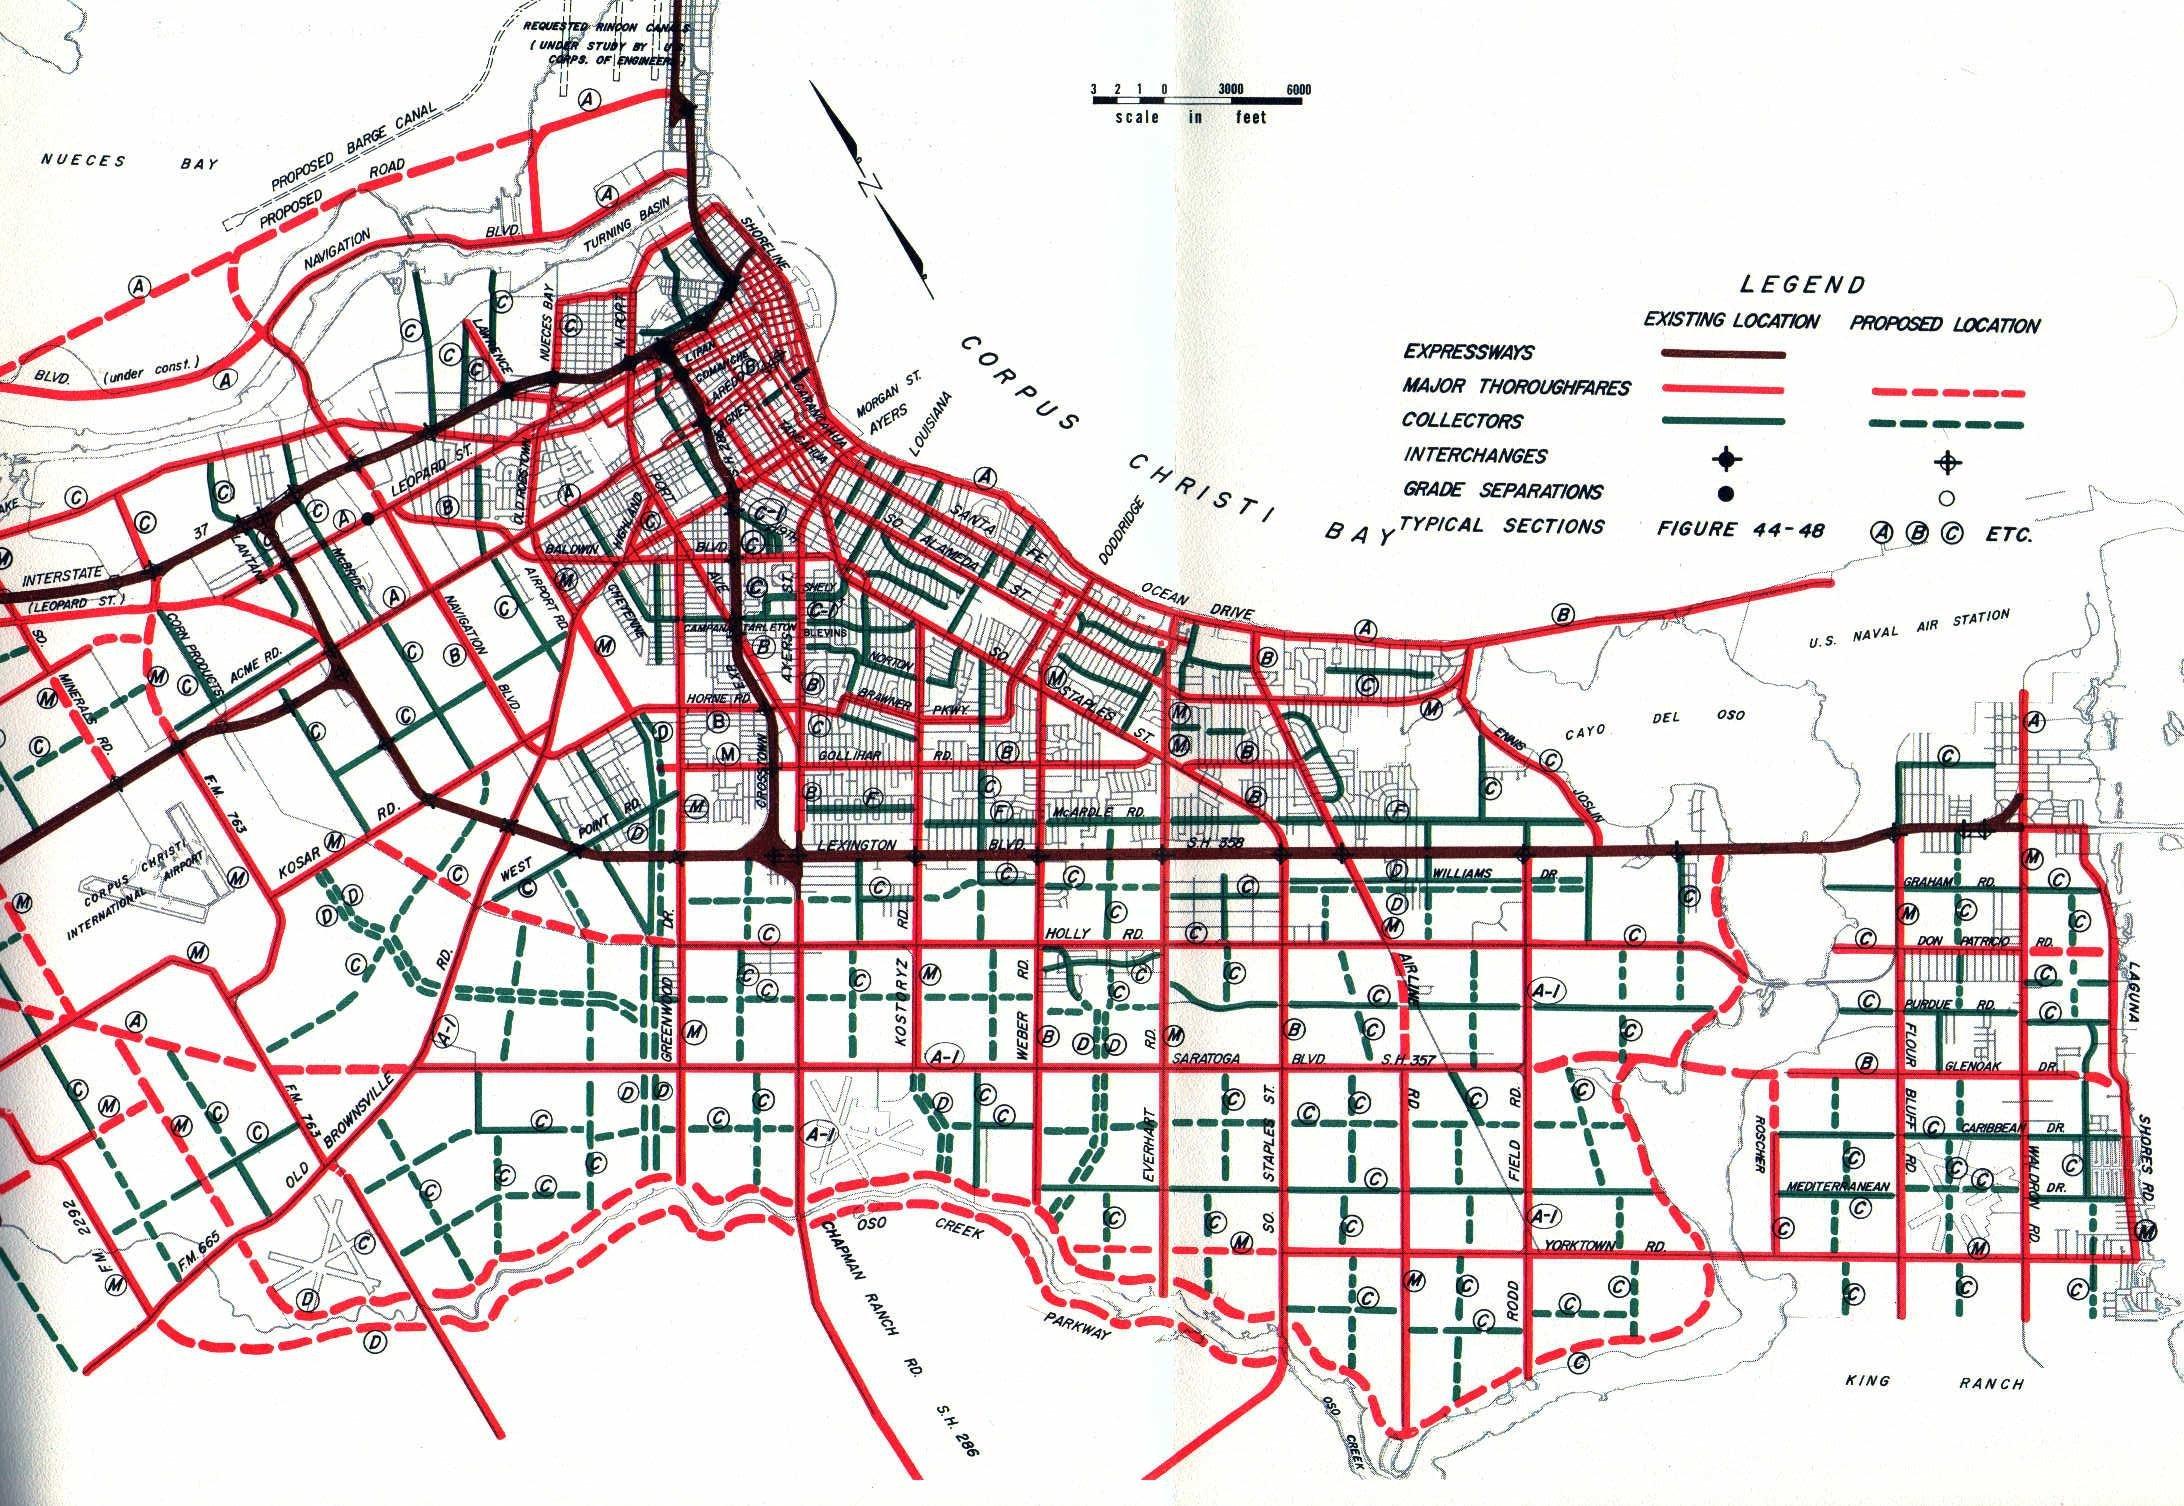 Texasfreeway > Corpus Christi - City Map Of Corpus Christi Texas